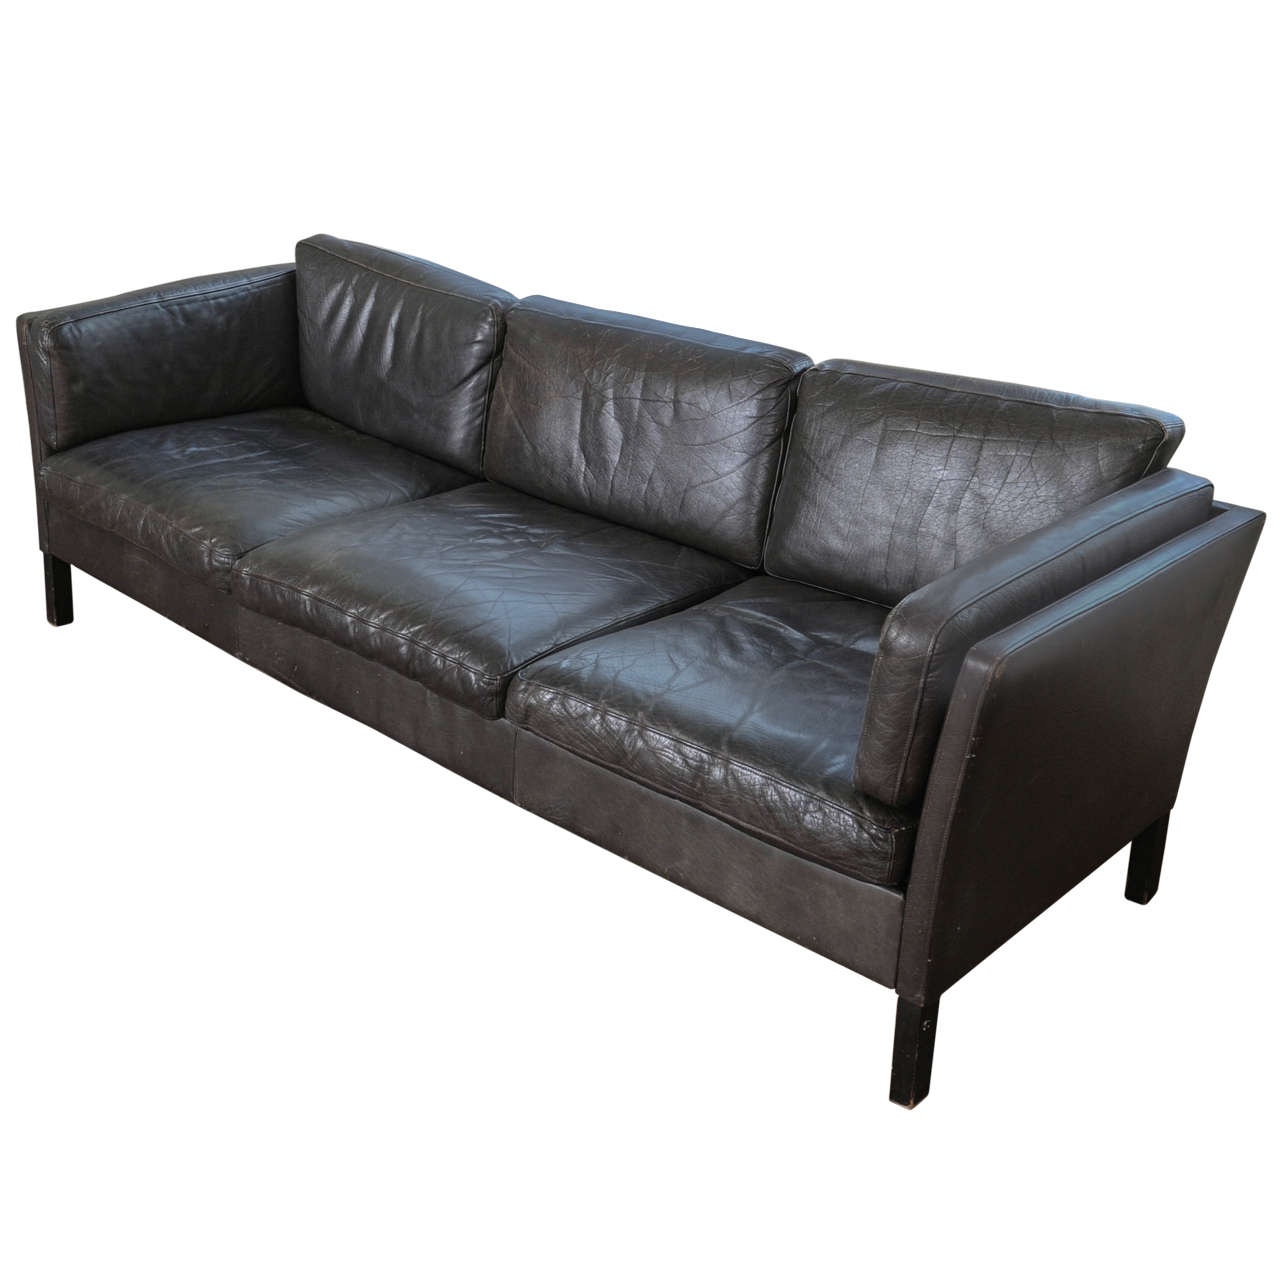 1960s Danish Three Seat Vintage Design Sofa With Black Leather Upholstered Vintage Sofa Modern Leather Sofa Vintage Leather Sofa